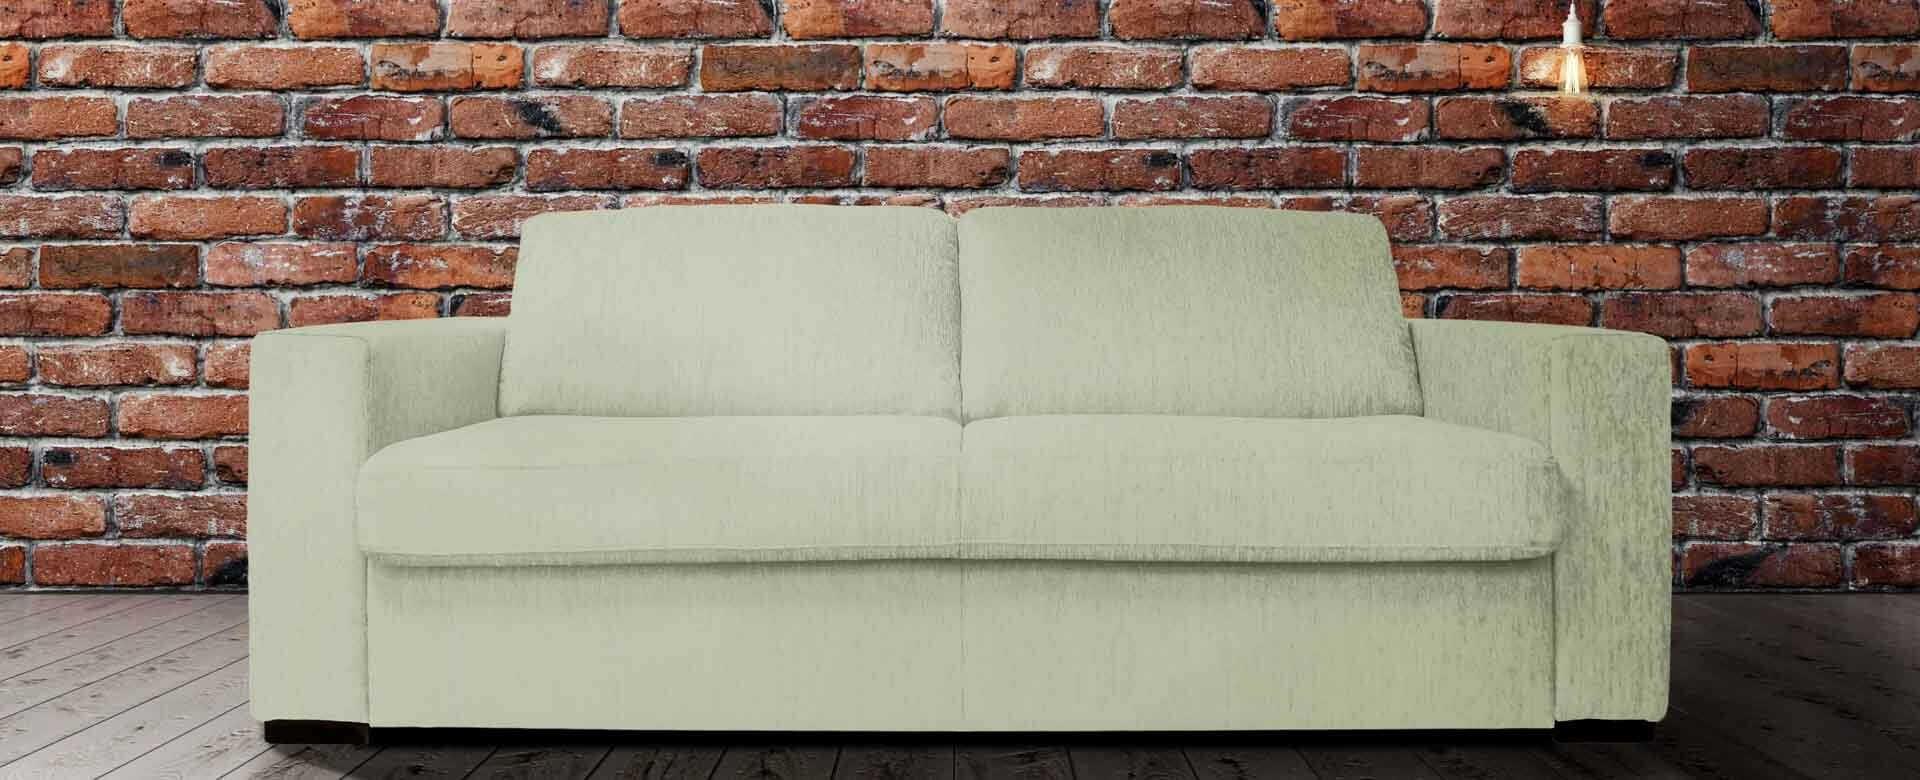 #3 - sofa bed trojsed